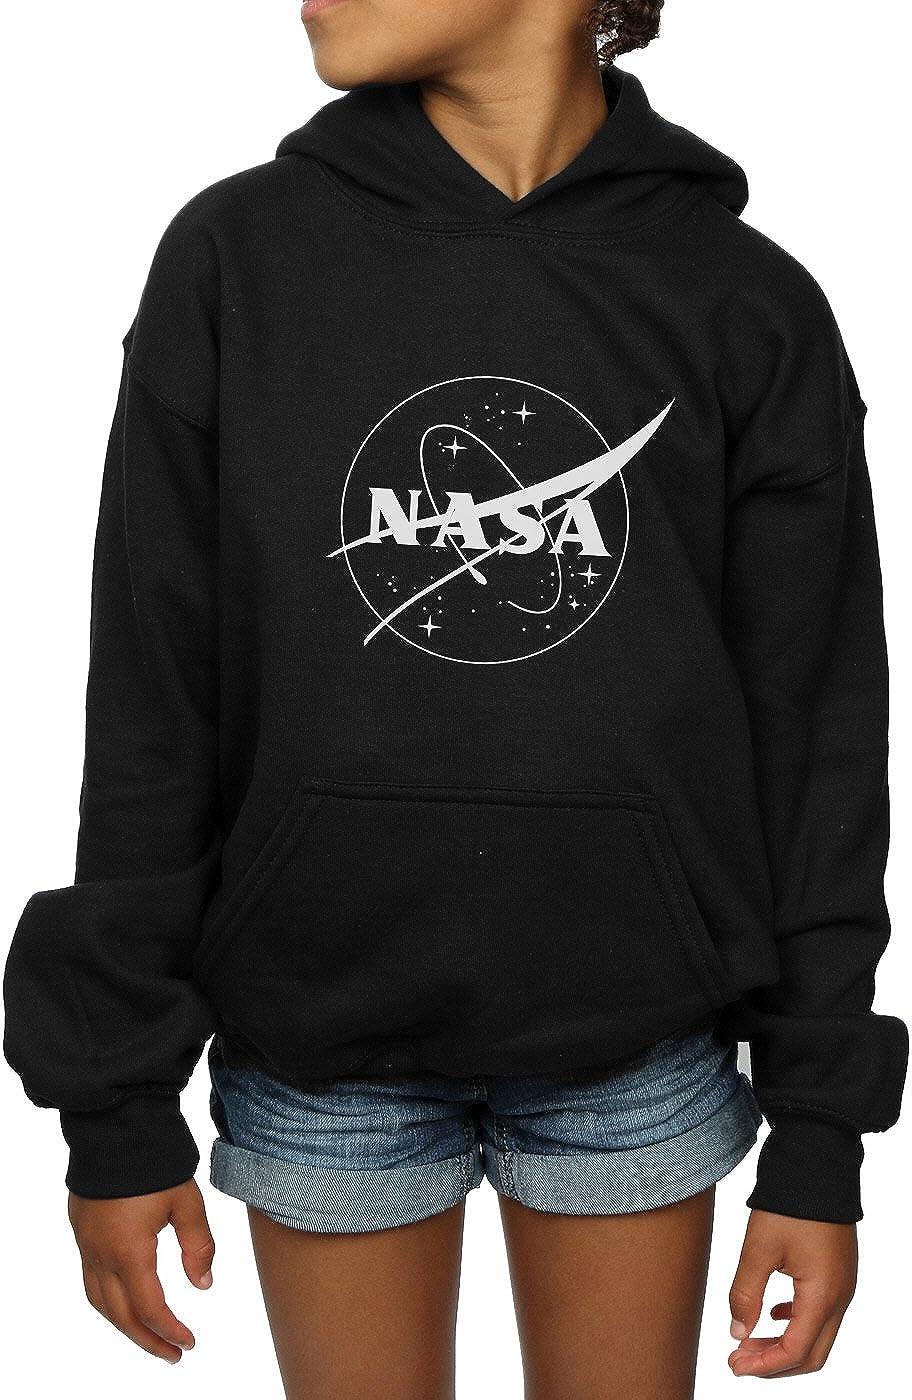 NASA Girls Classic Insignia Logo Monochrome Hoodie